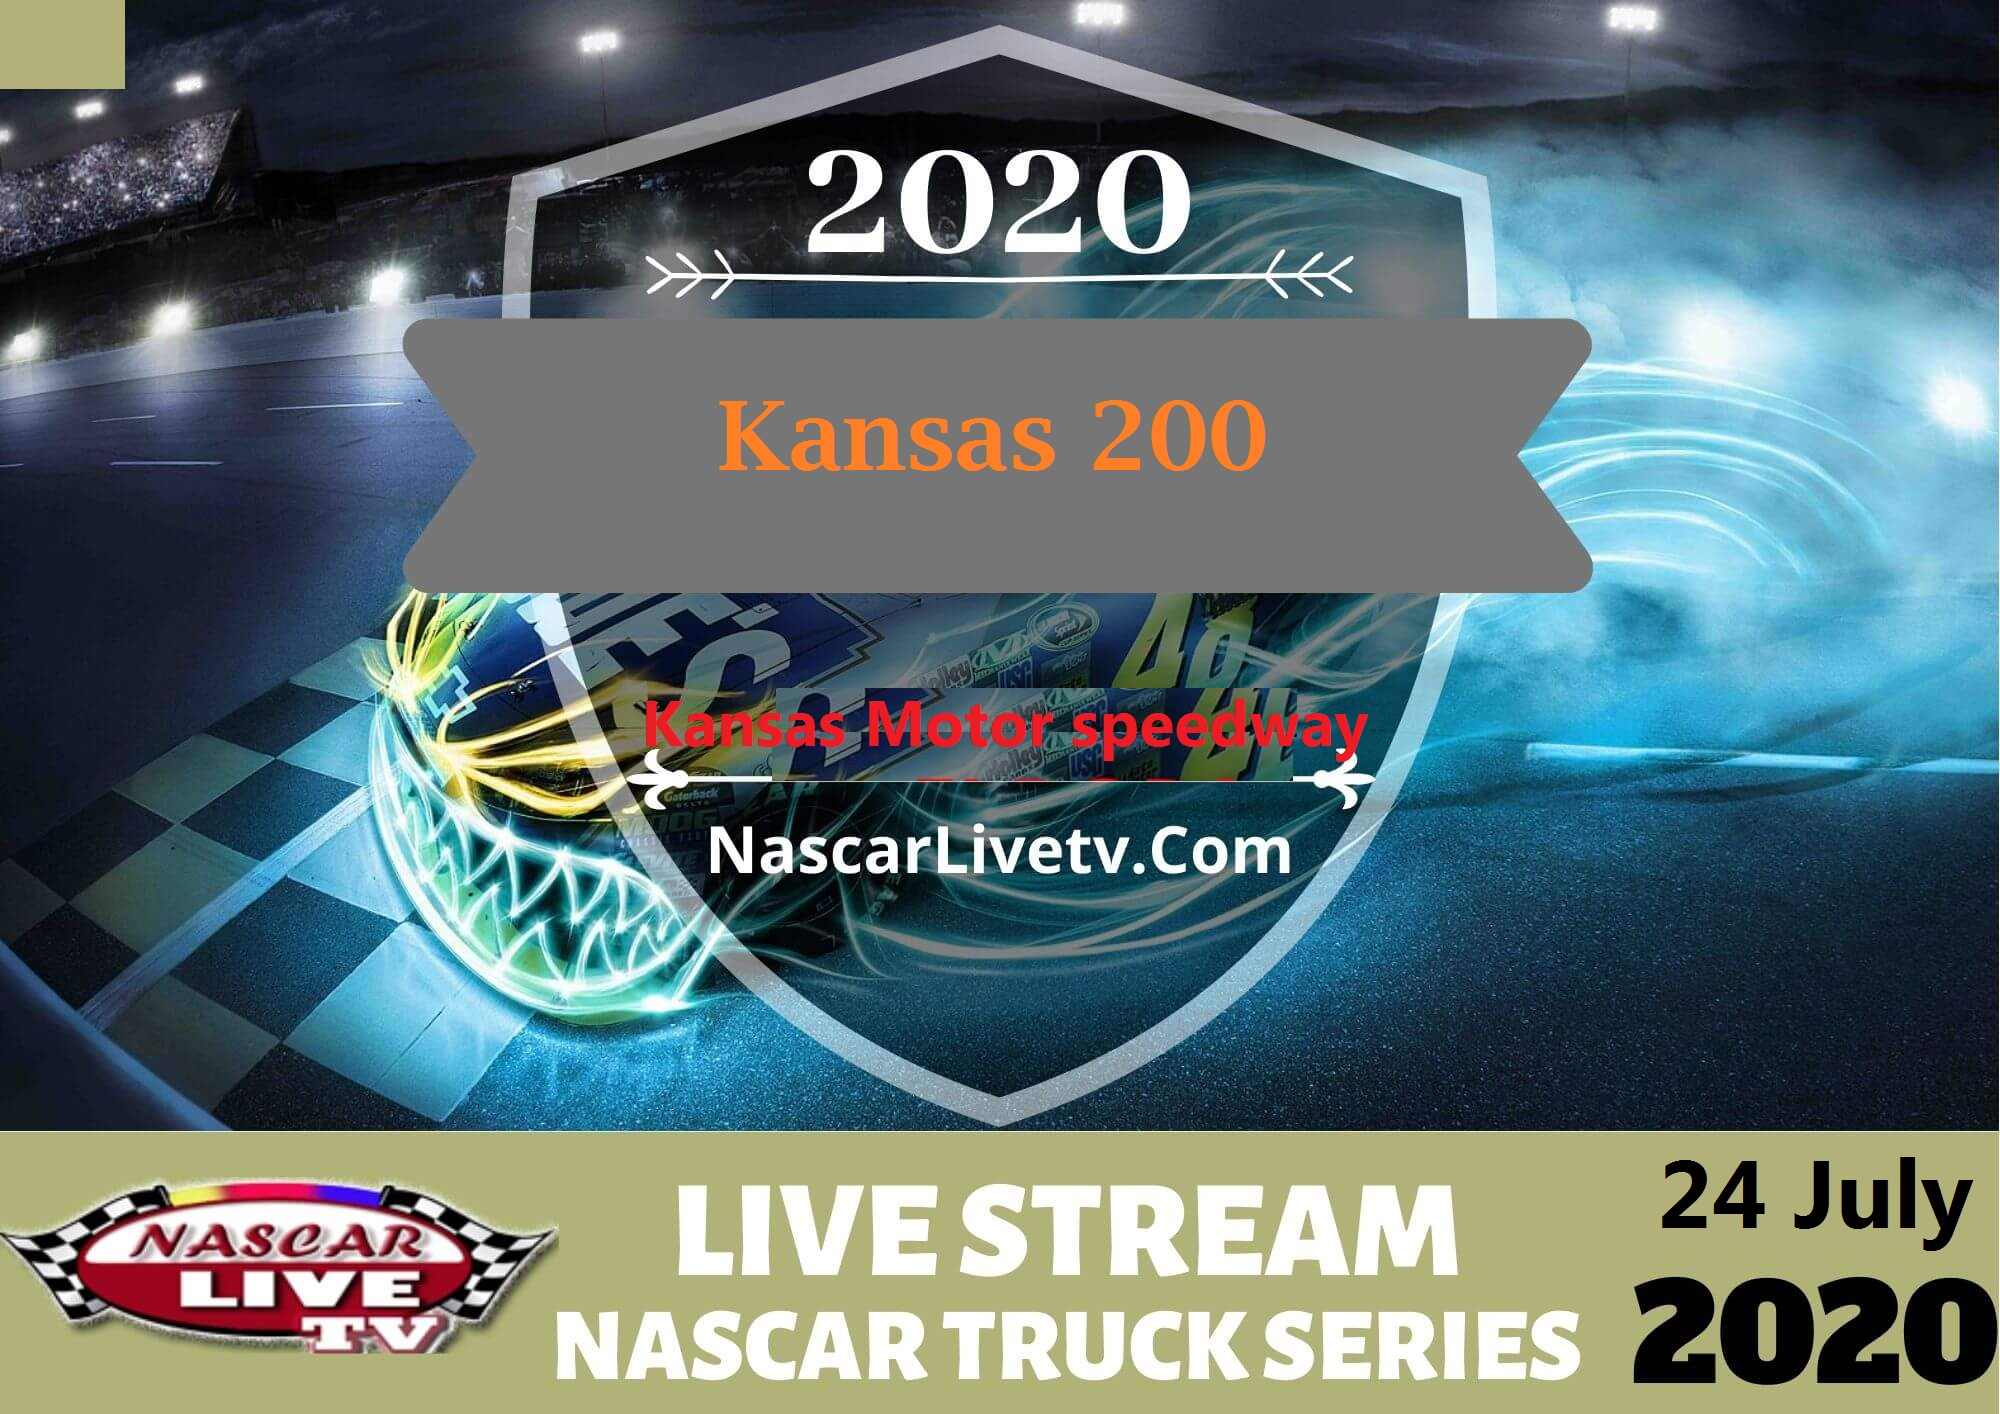 nascar-truck-kansas-200-live-stream